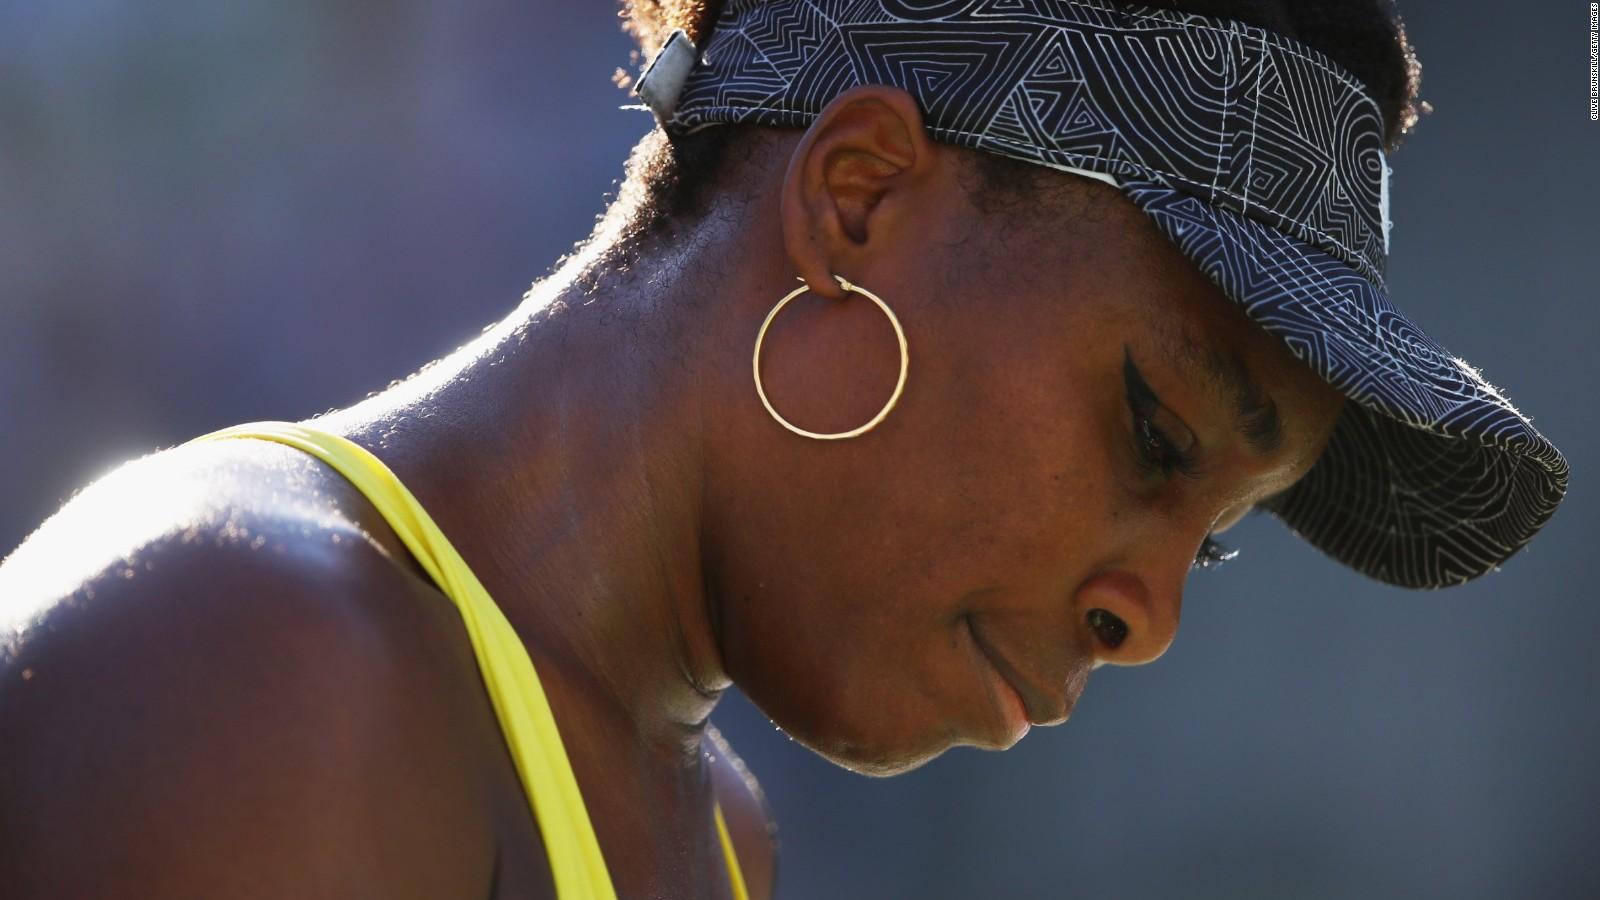 Venus Williams at fault in fatal crash victim s family sues CNN